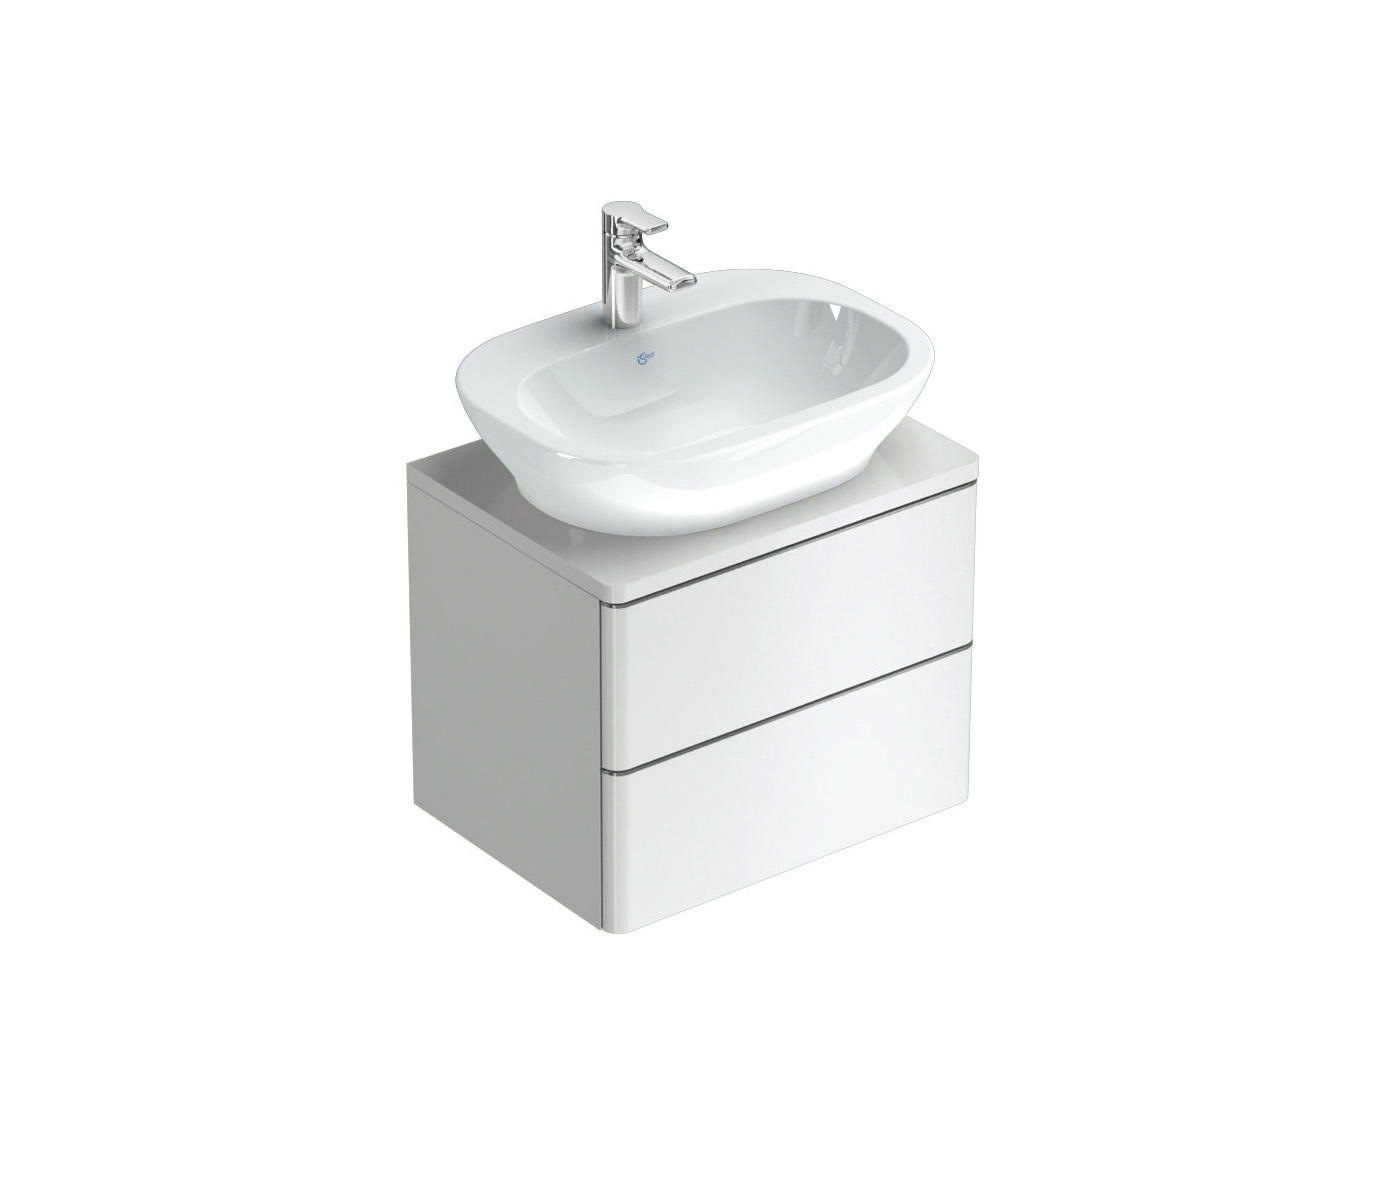 softmood waschtisch unterschrank 600mm mobili lavabo. Black Bedroom Furniture Sets. Home Design Ideas